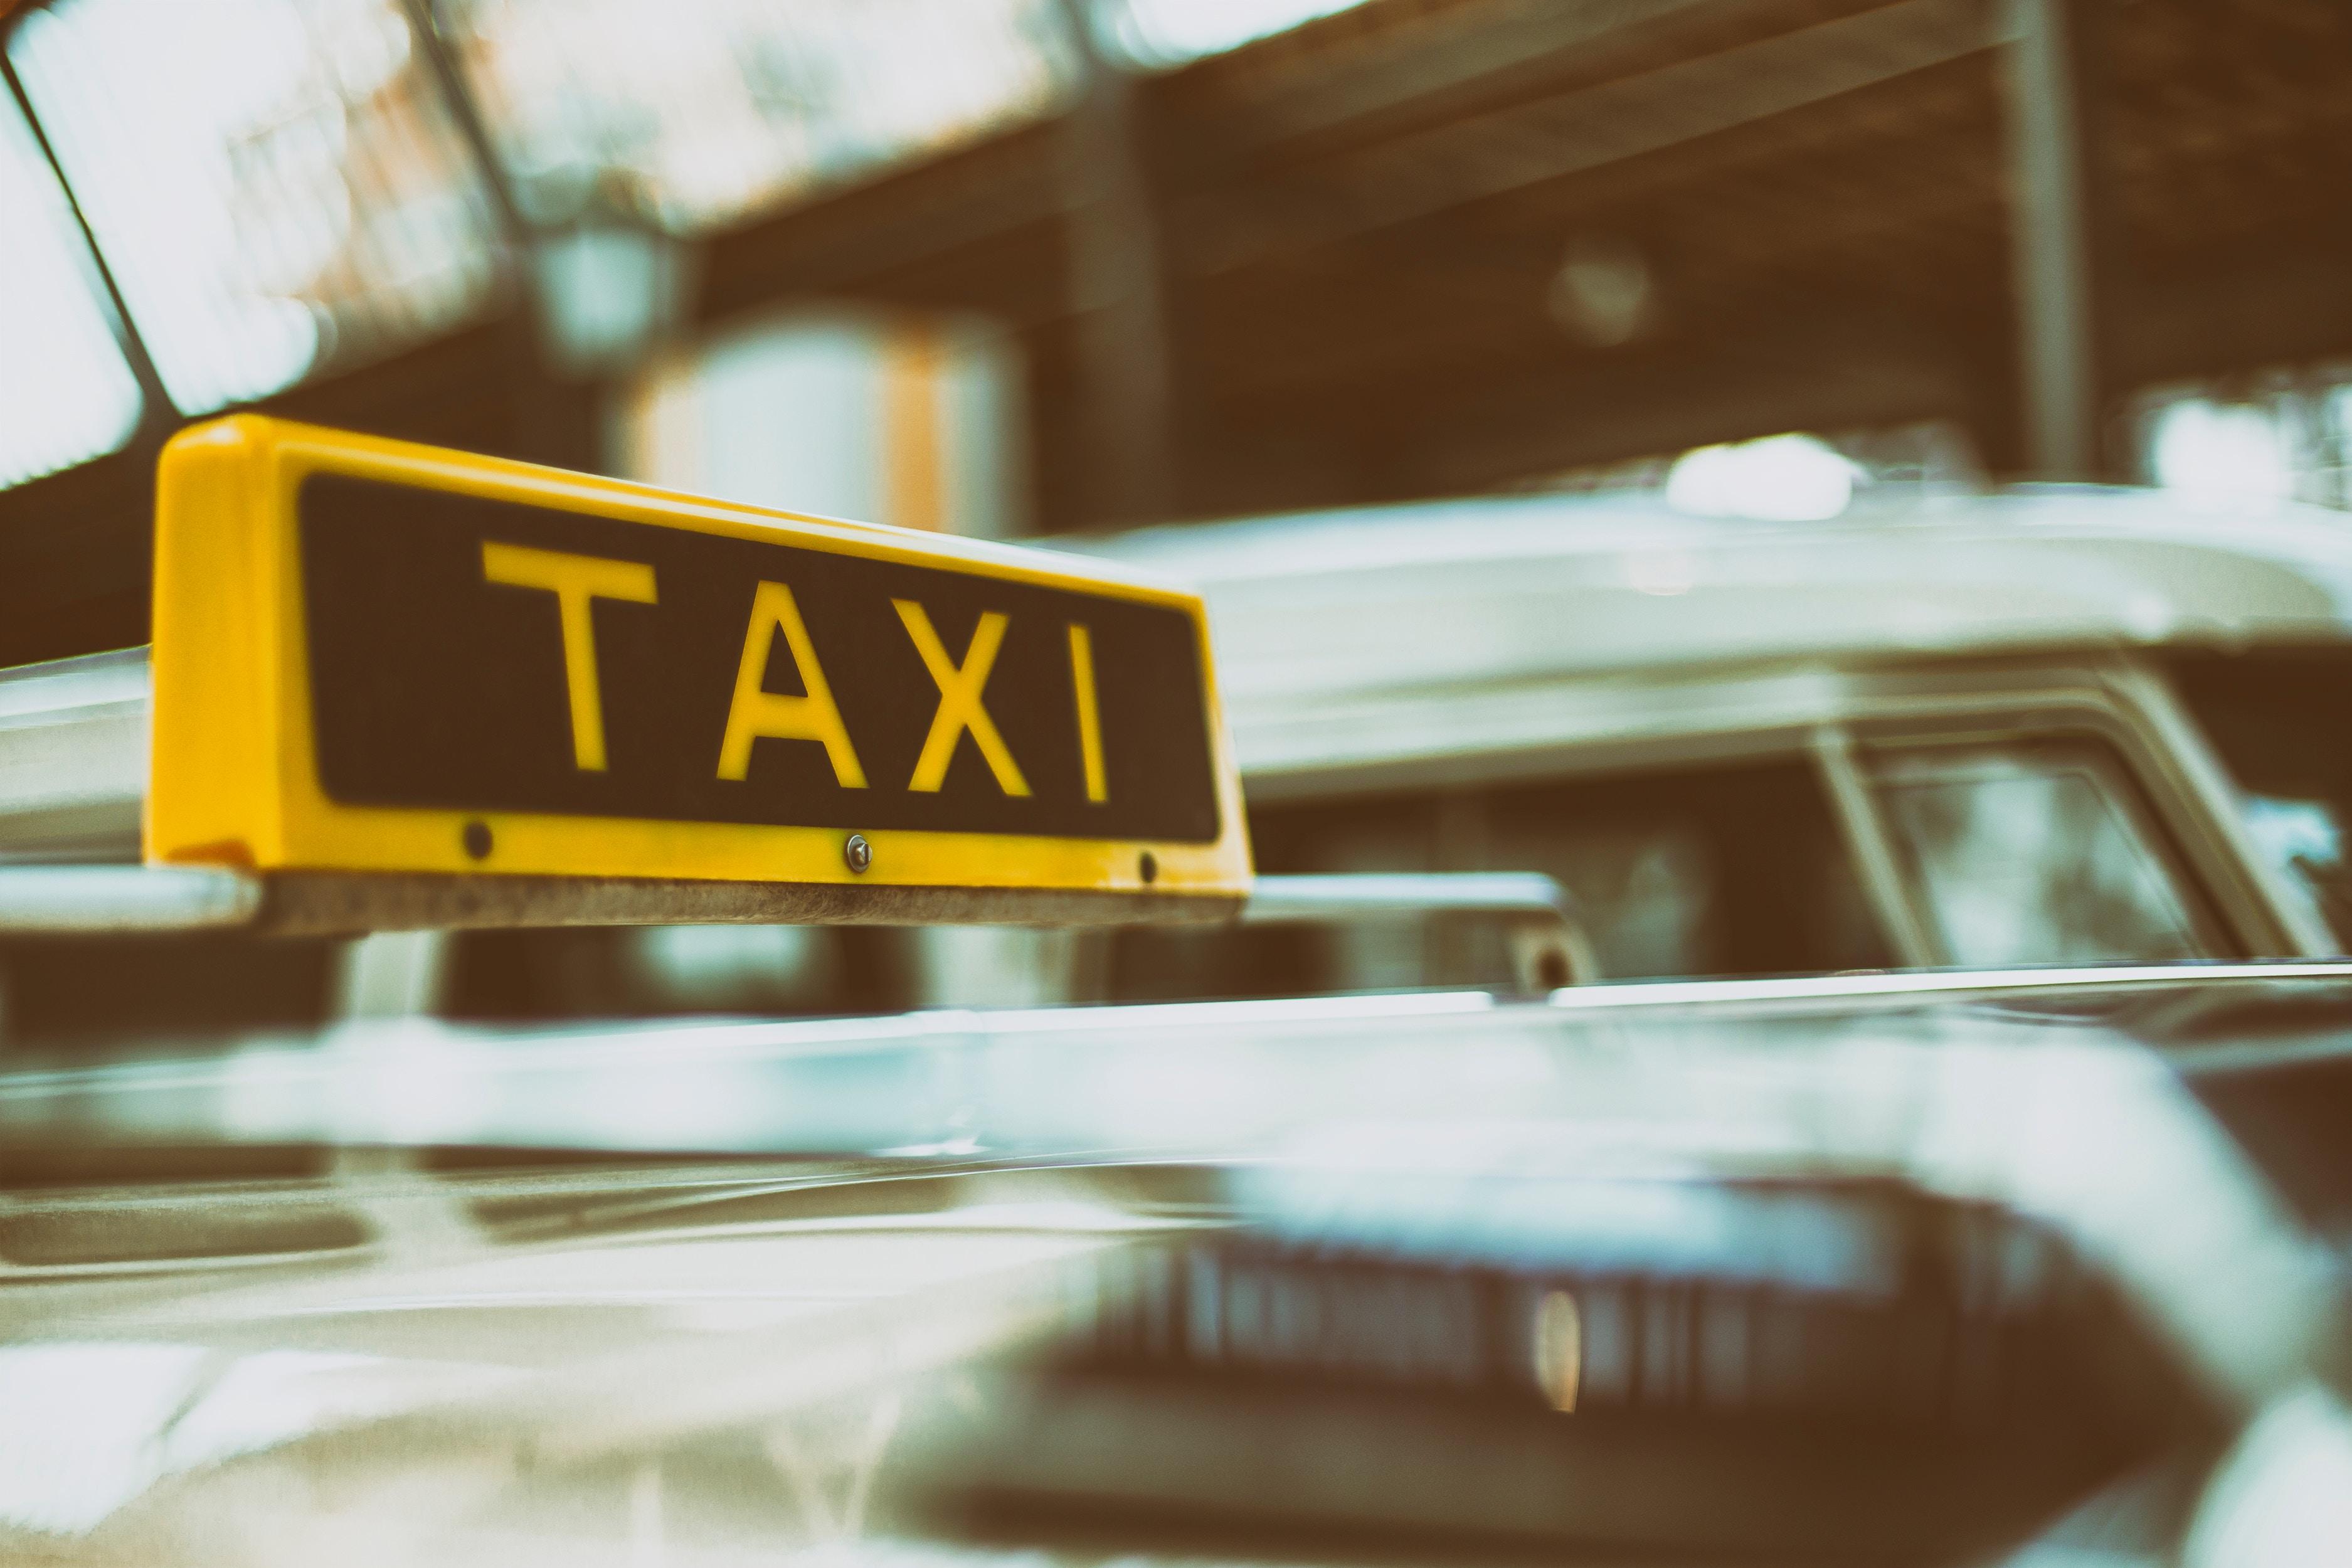 taxi gdańsk lotnisko, gdansk airport taxi, taxi gdansk flyplass, taxi gdańsk lotnisko, city taxi gdańsk, city tour gdansk, vip transport, bus lotnisko gdańsk, city taxi gdańsk, taxi gdańsk lotnisko, przewóz osób gdańsk, vip transport, gdansk airport taxi, gdansk airport transfer, taxi gdansk flyplass, bus lotnisko gdańsk, city tour gdańsk, city tour gdansk,